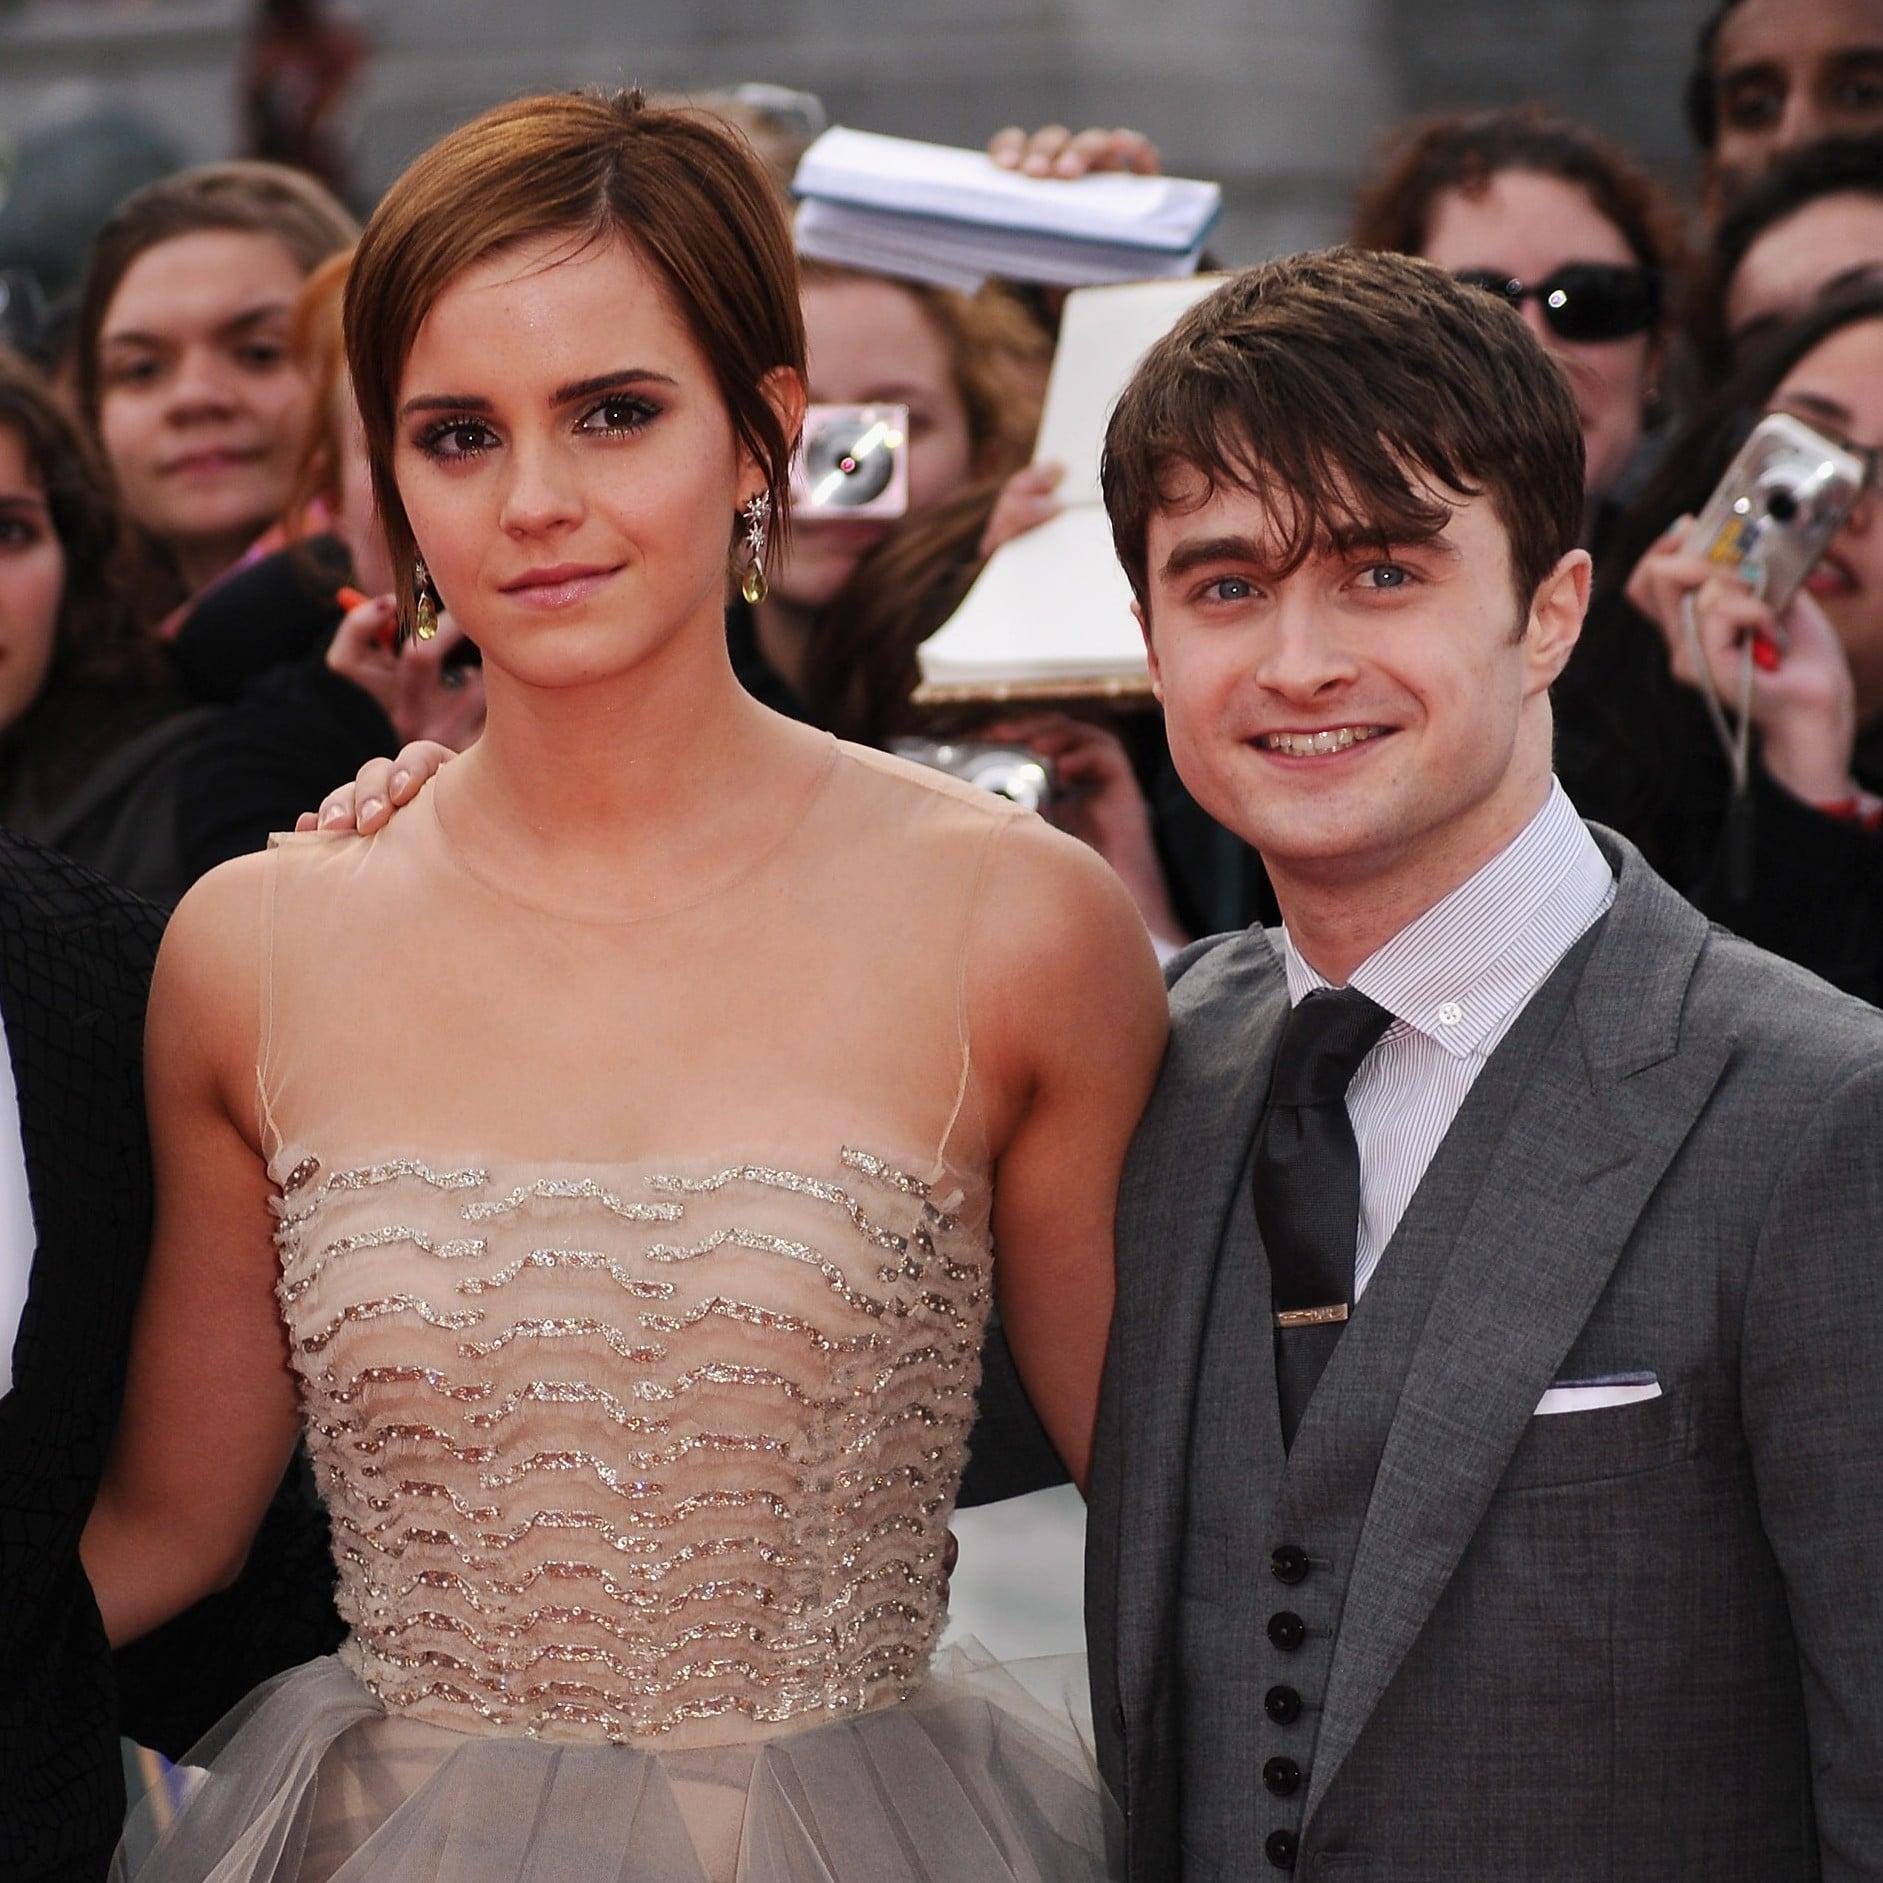 Emma Watson Talks About Harry Potter Cast